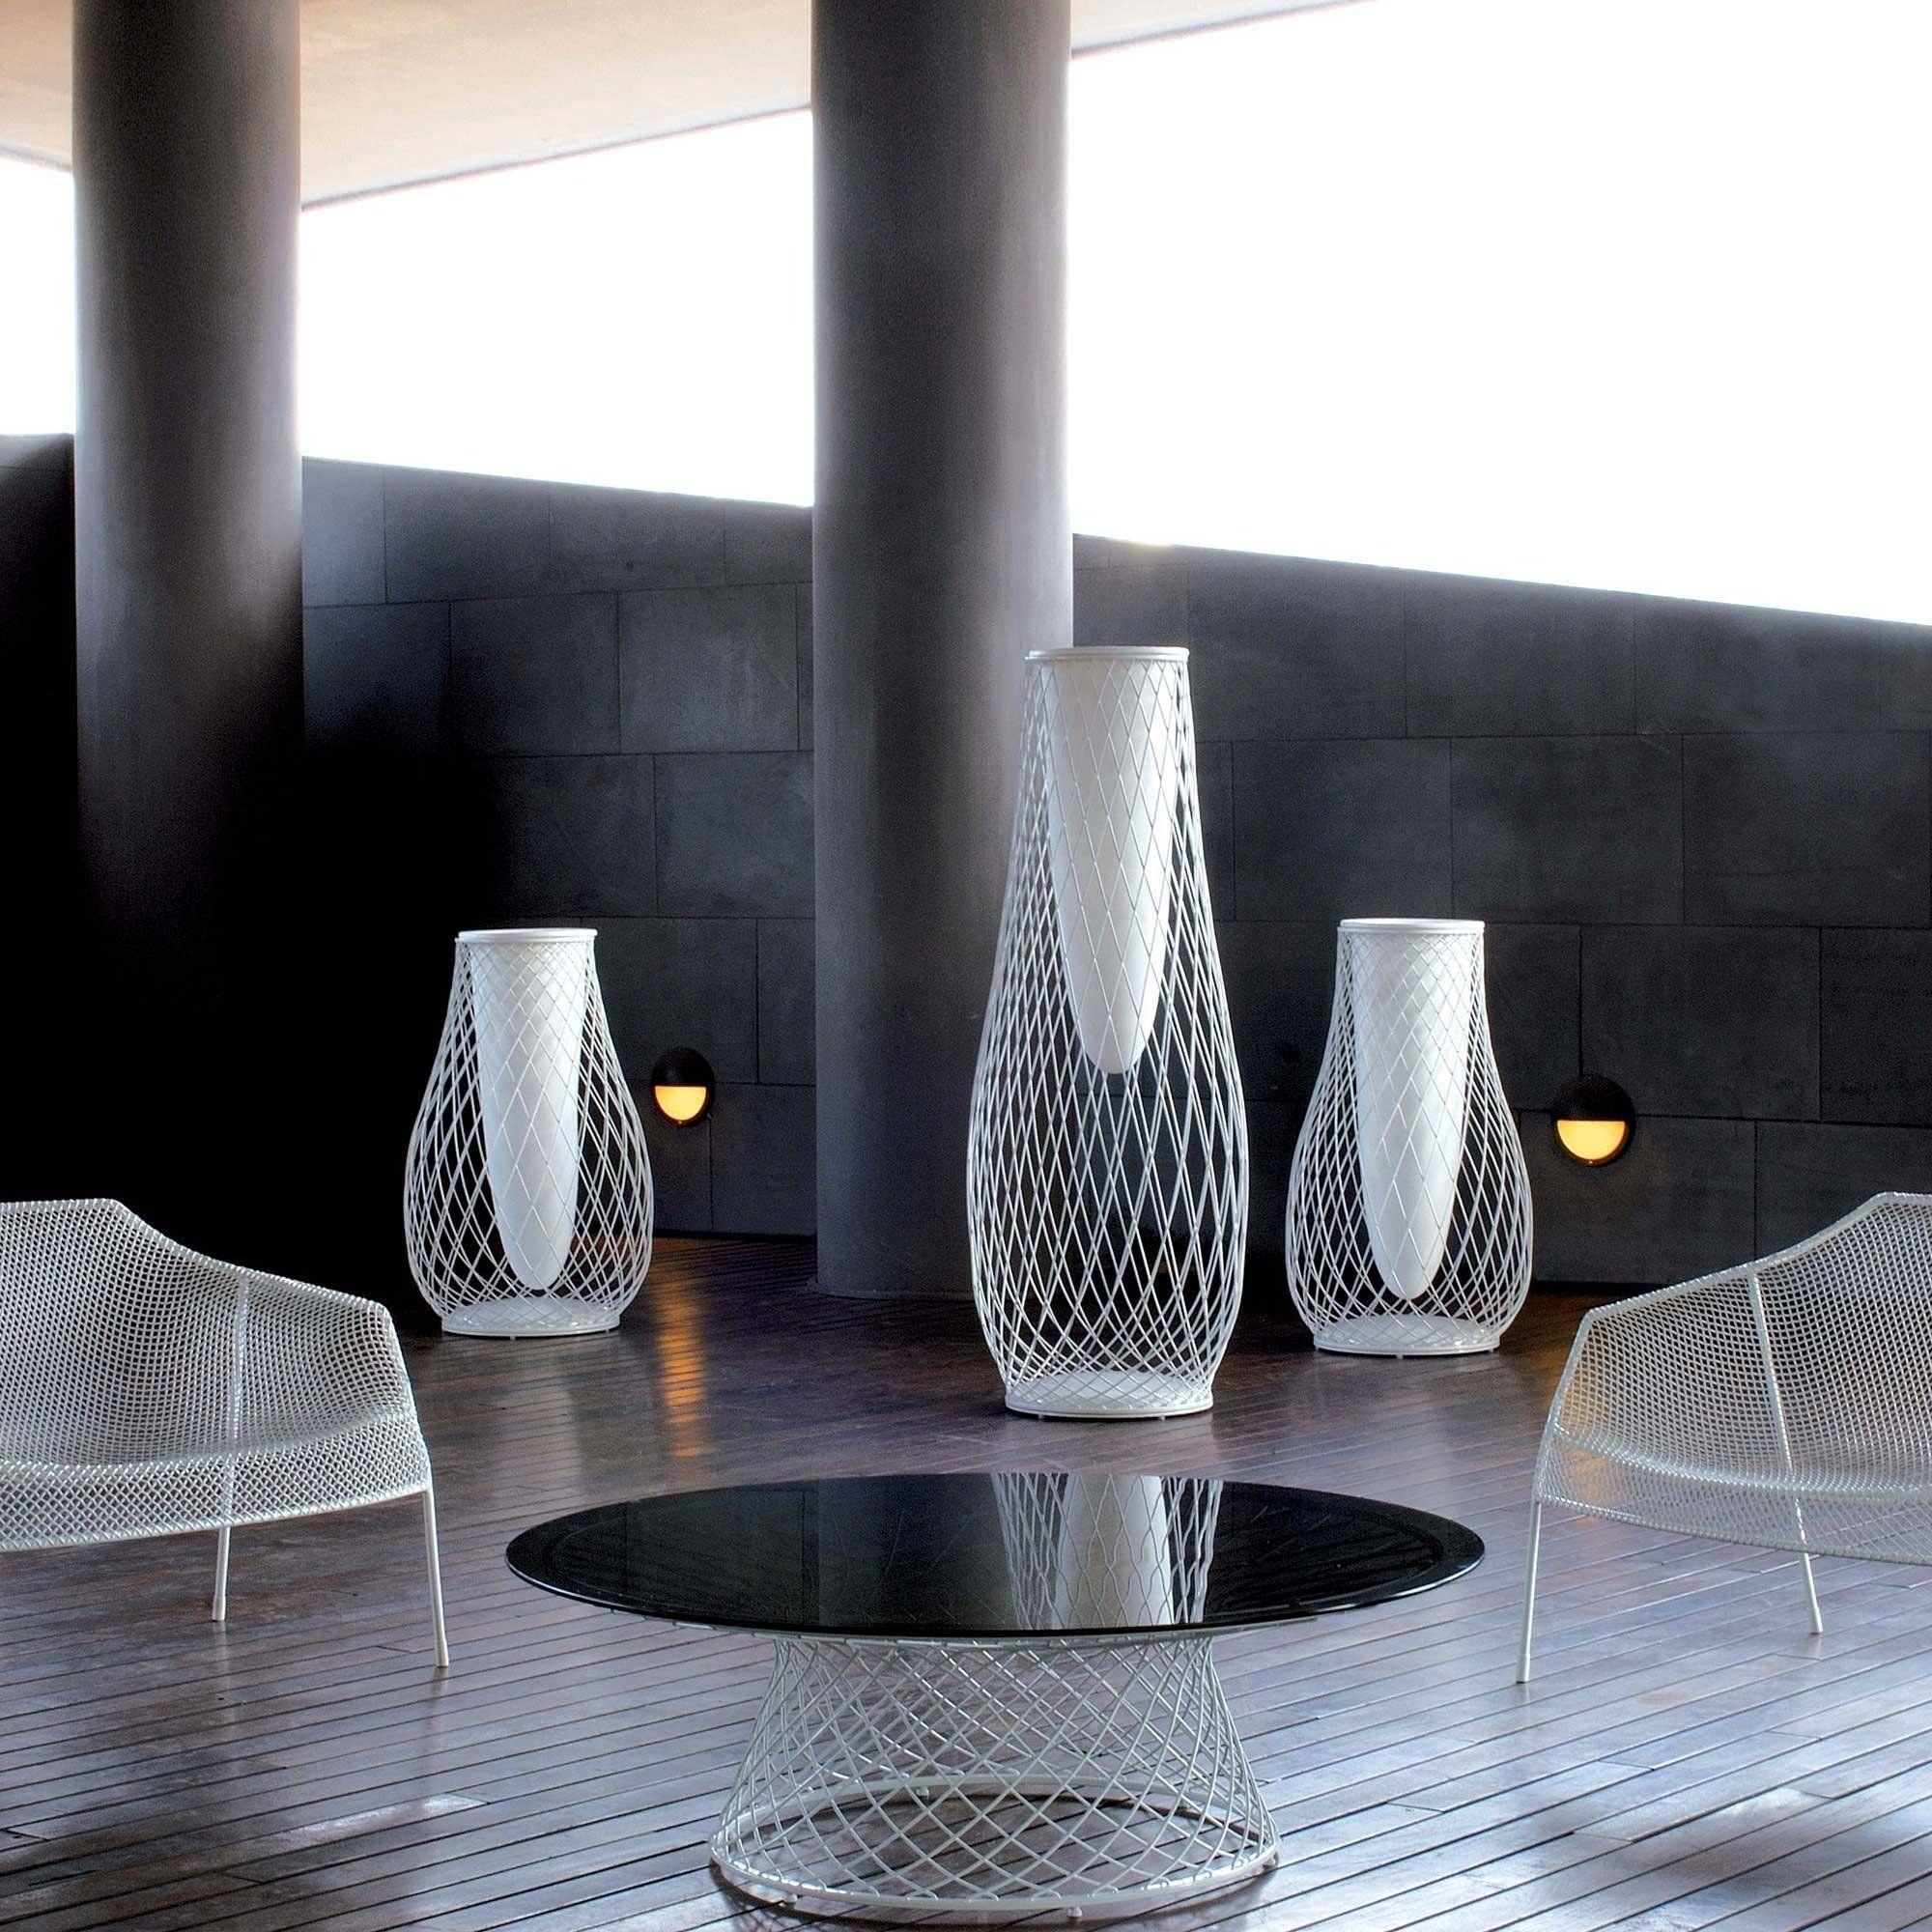 emu Heaven Vase/Flowerpot   AmbienteDirect on zinc car, zinc patina, zinc dog, zinc basket, zinc metal, zinc chest, zinc desk, zinc table,